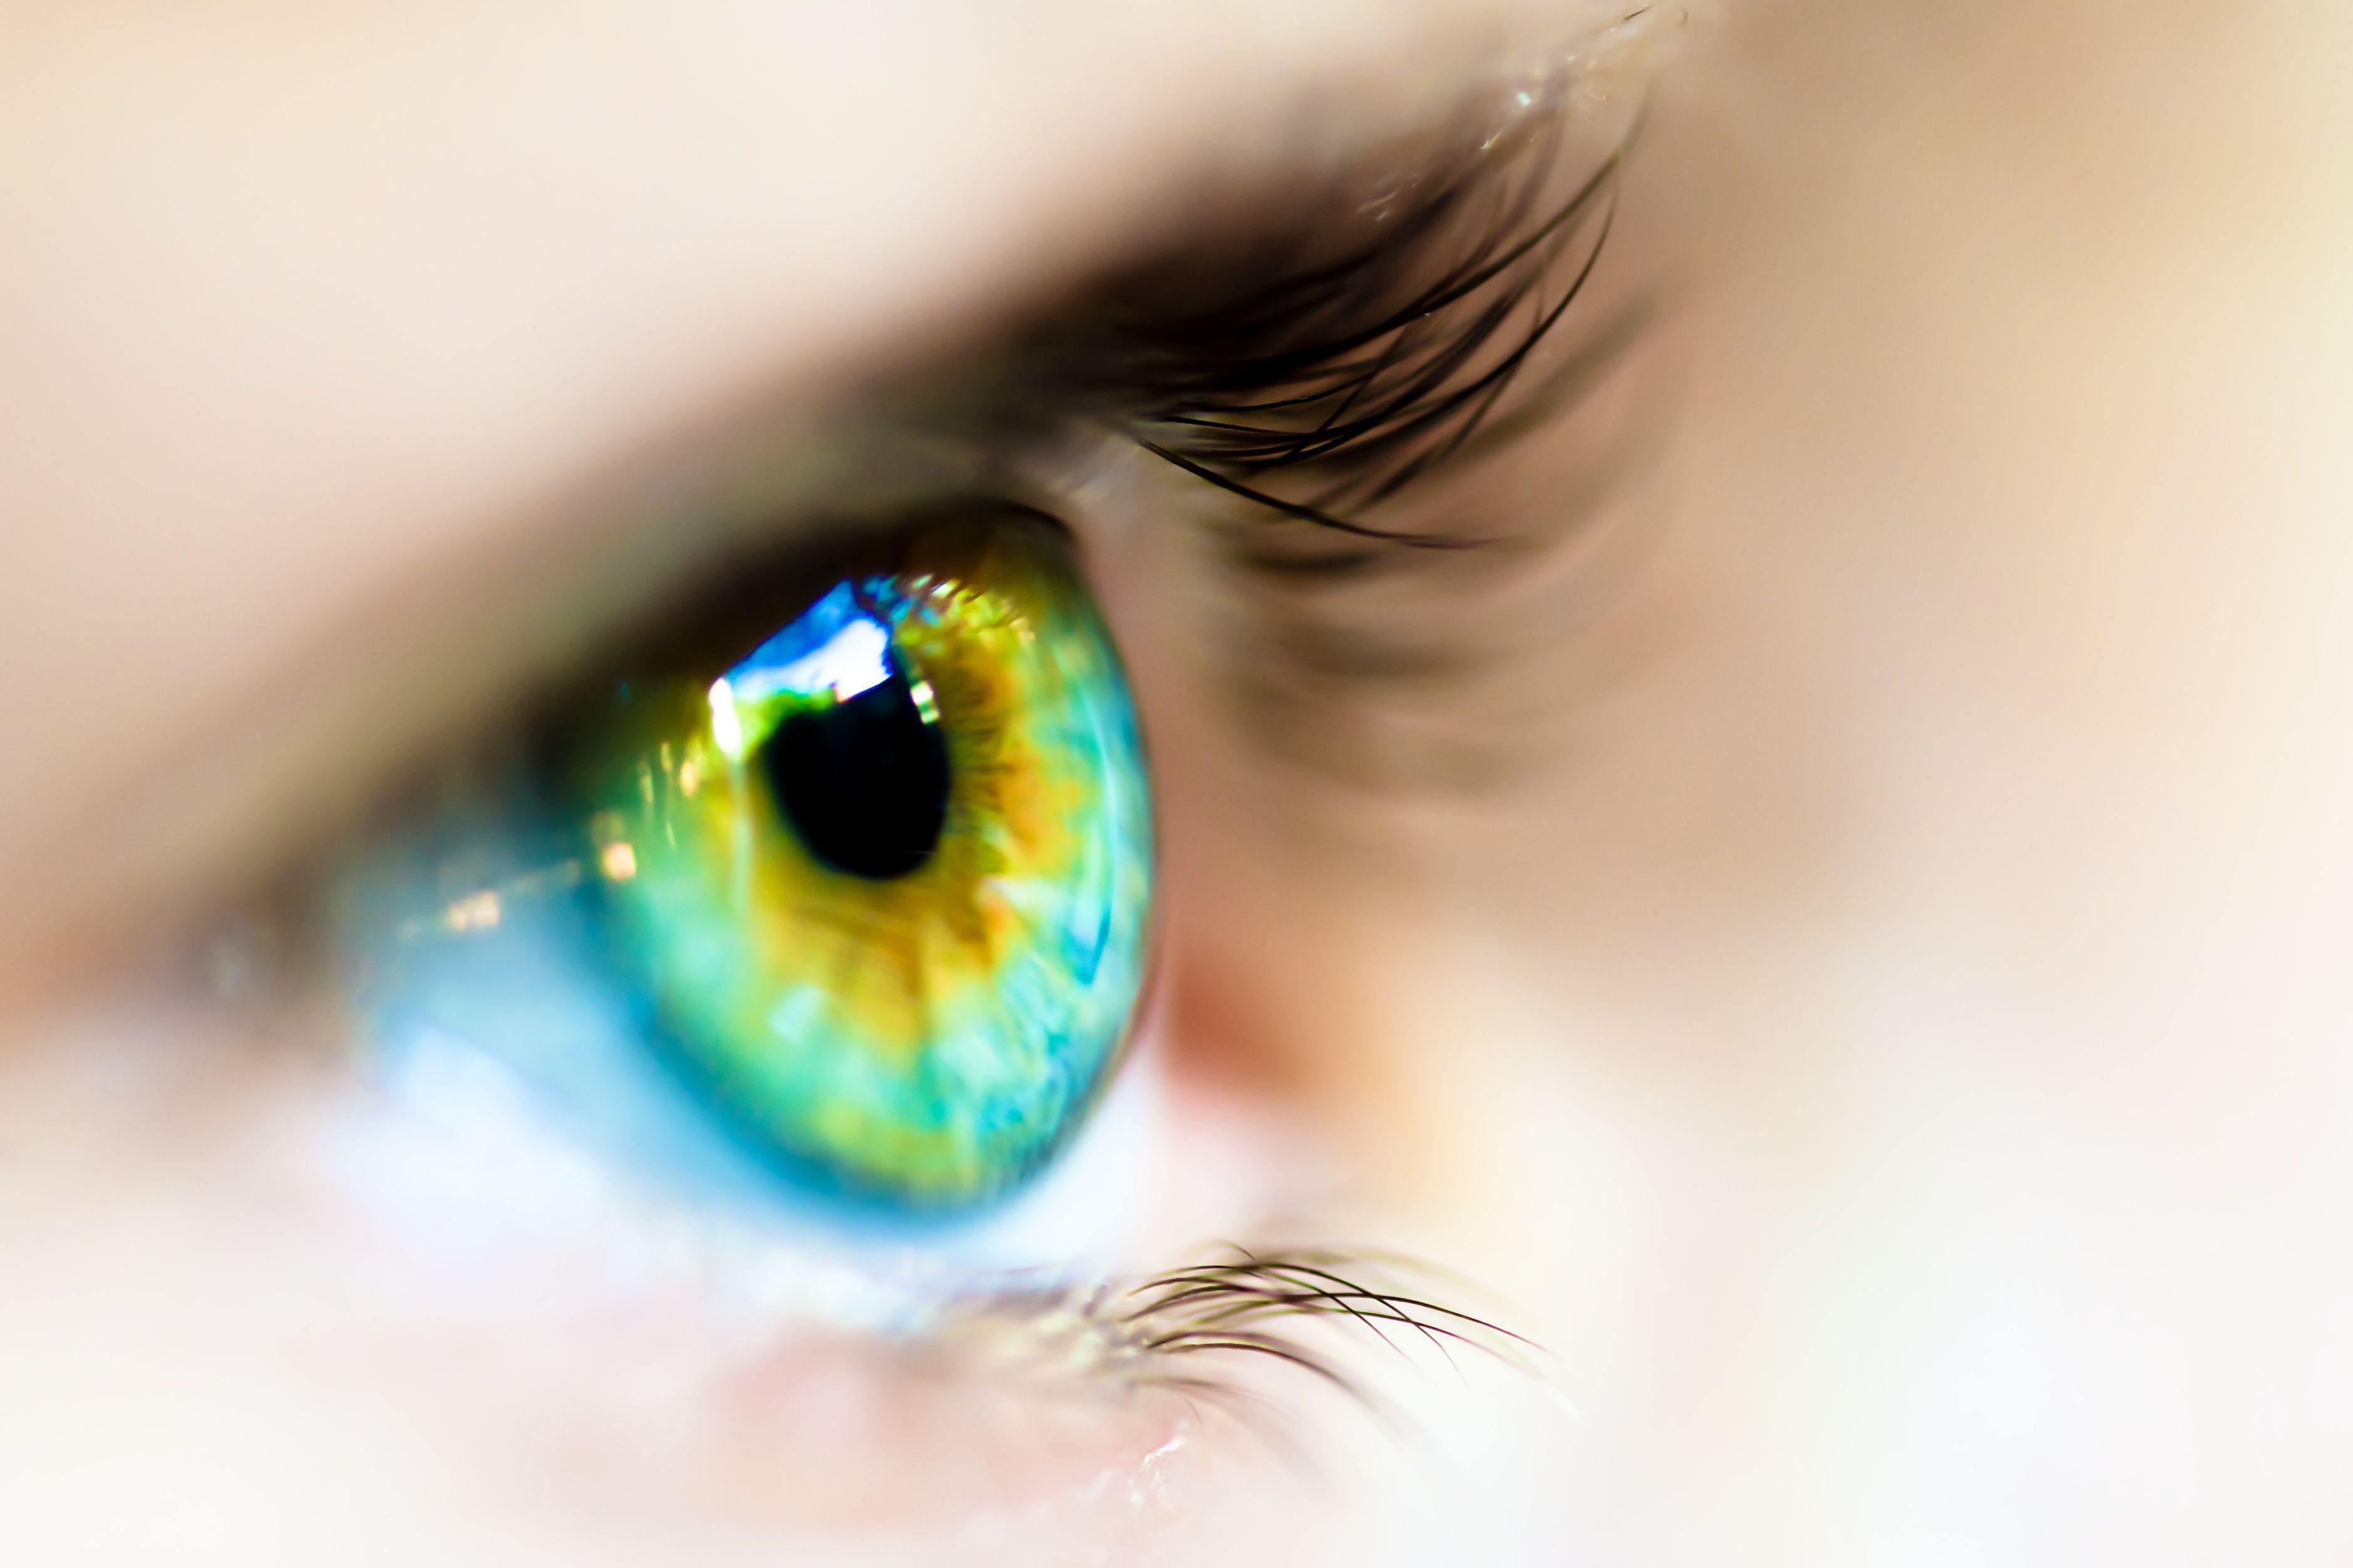 Monocular Cues for Depth Perception